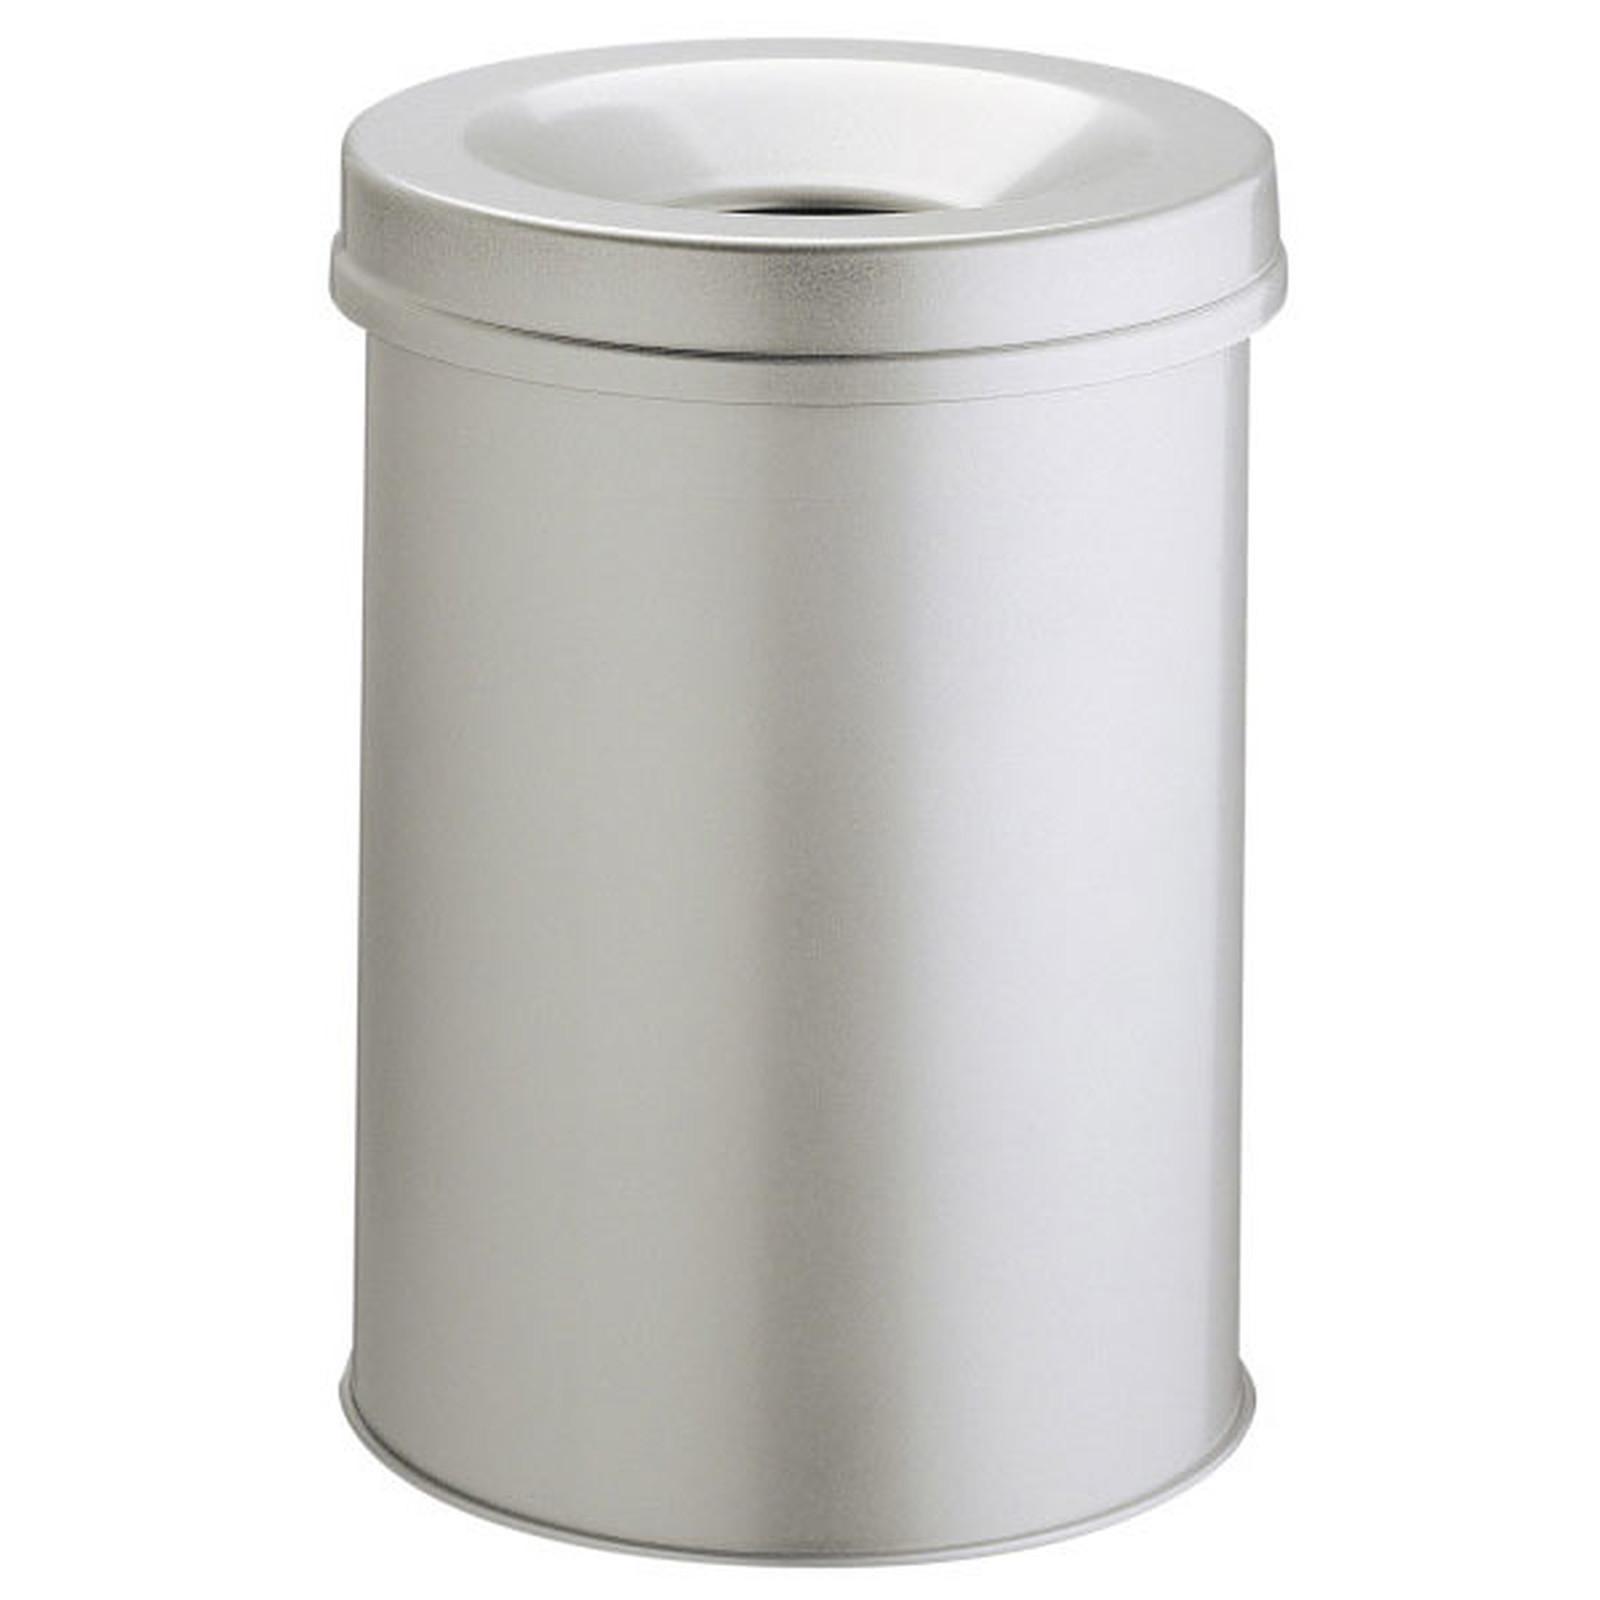 DURABLE Corbeille anti-feu 15 litres Gris